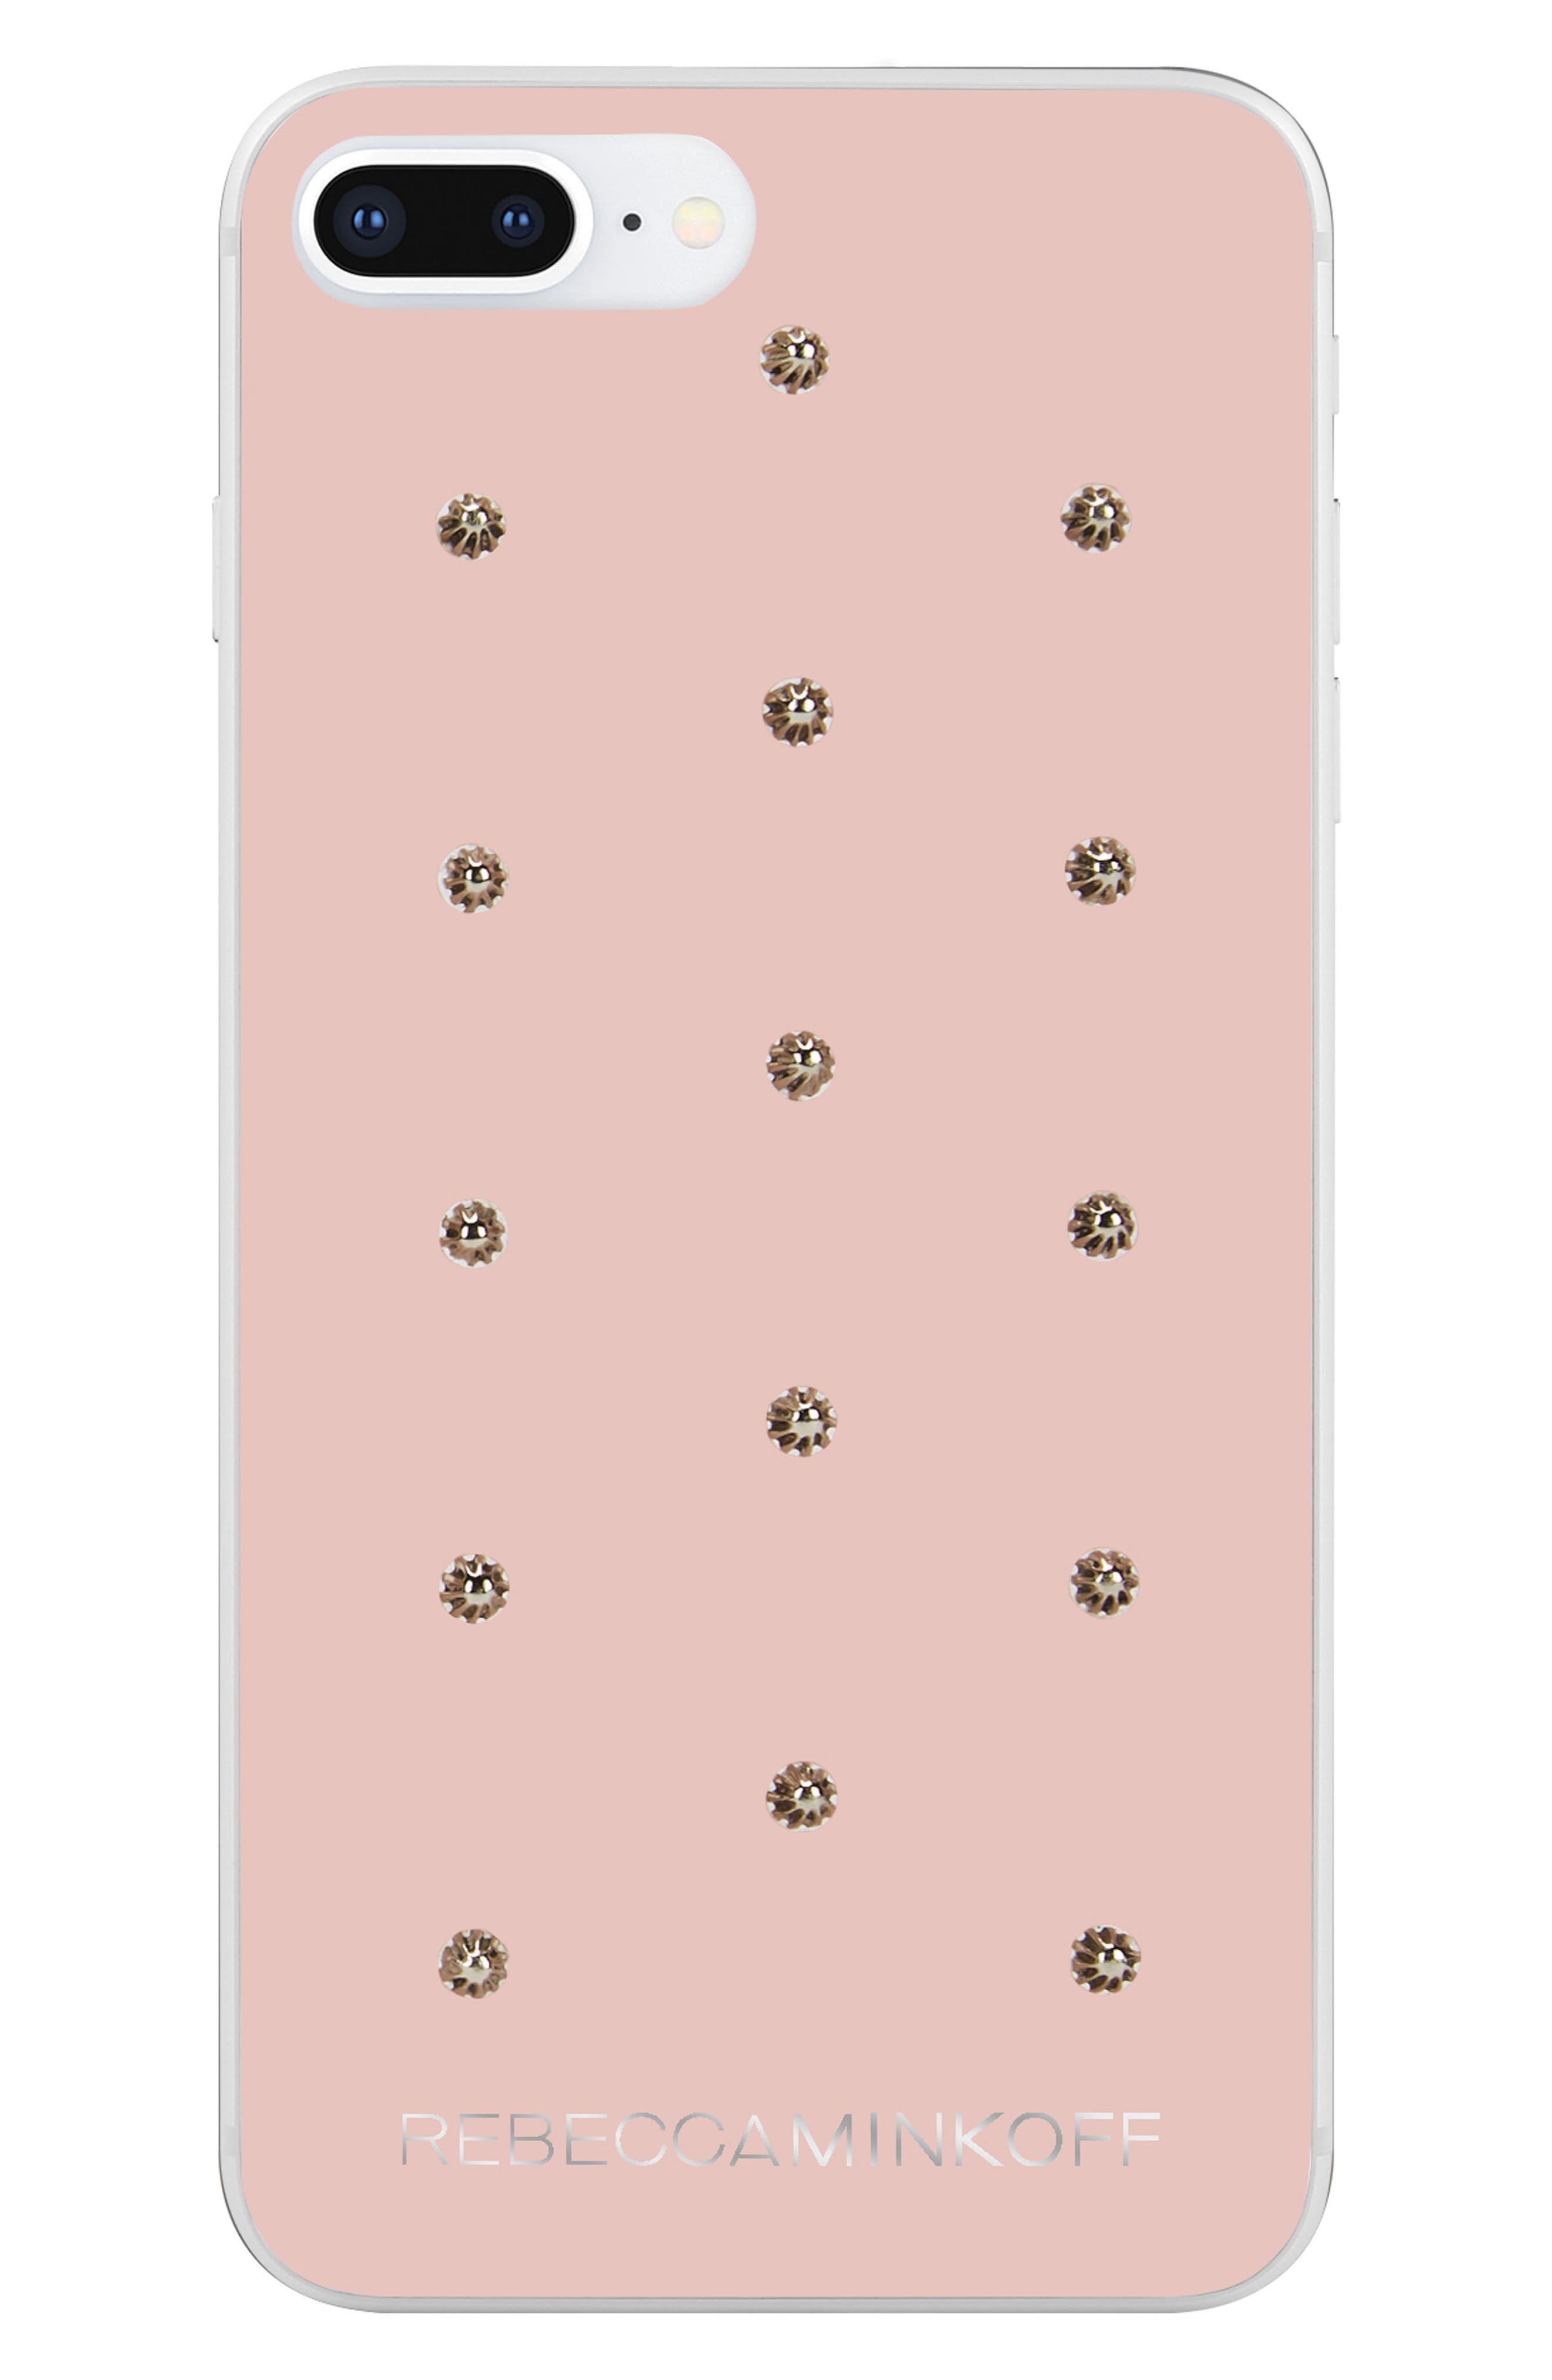 Flower Stud iPhone 7/8 & 7/8 Plus Case,                         Main,                         color, ROSE GOLD/ GOLD STUDS